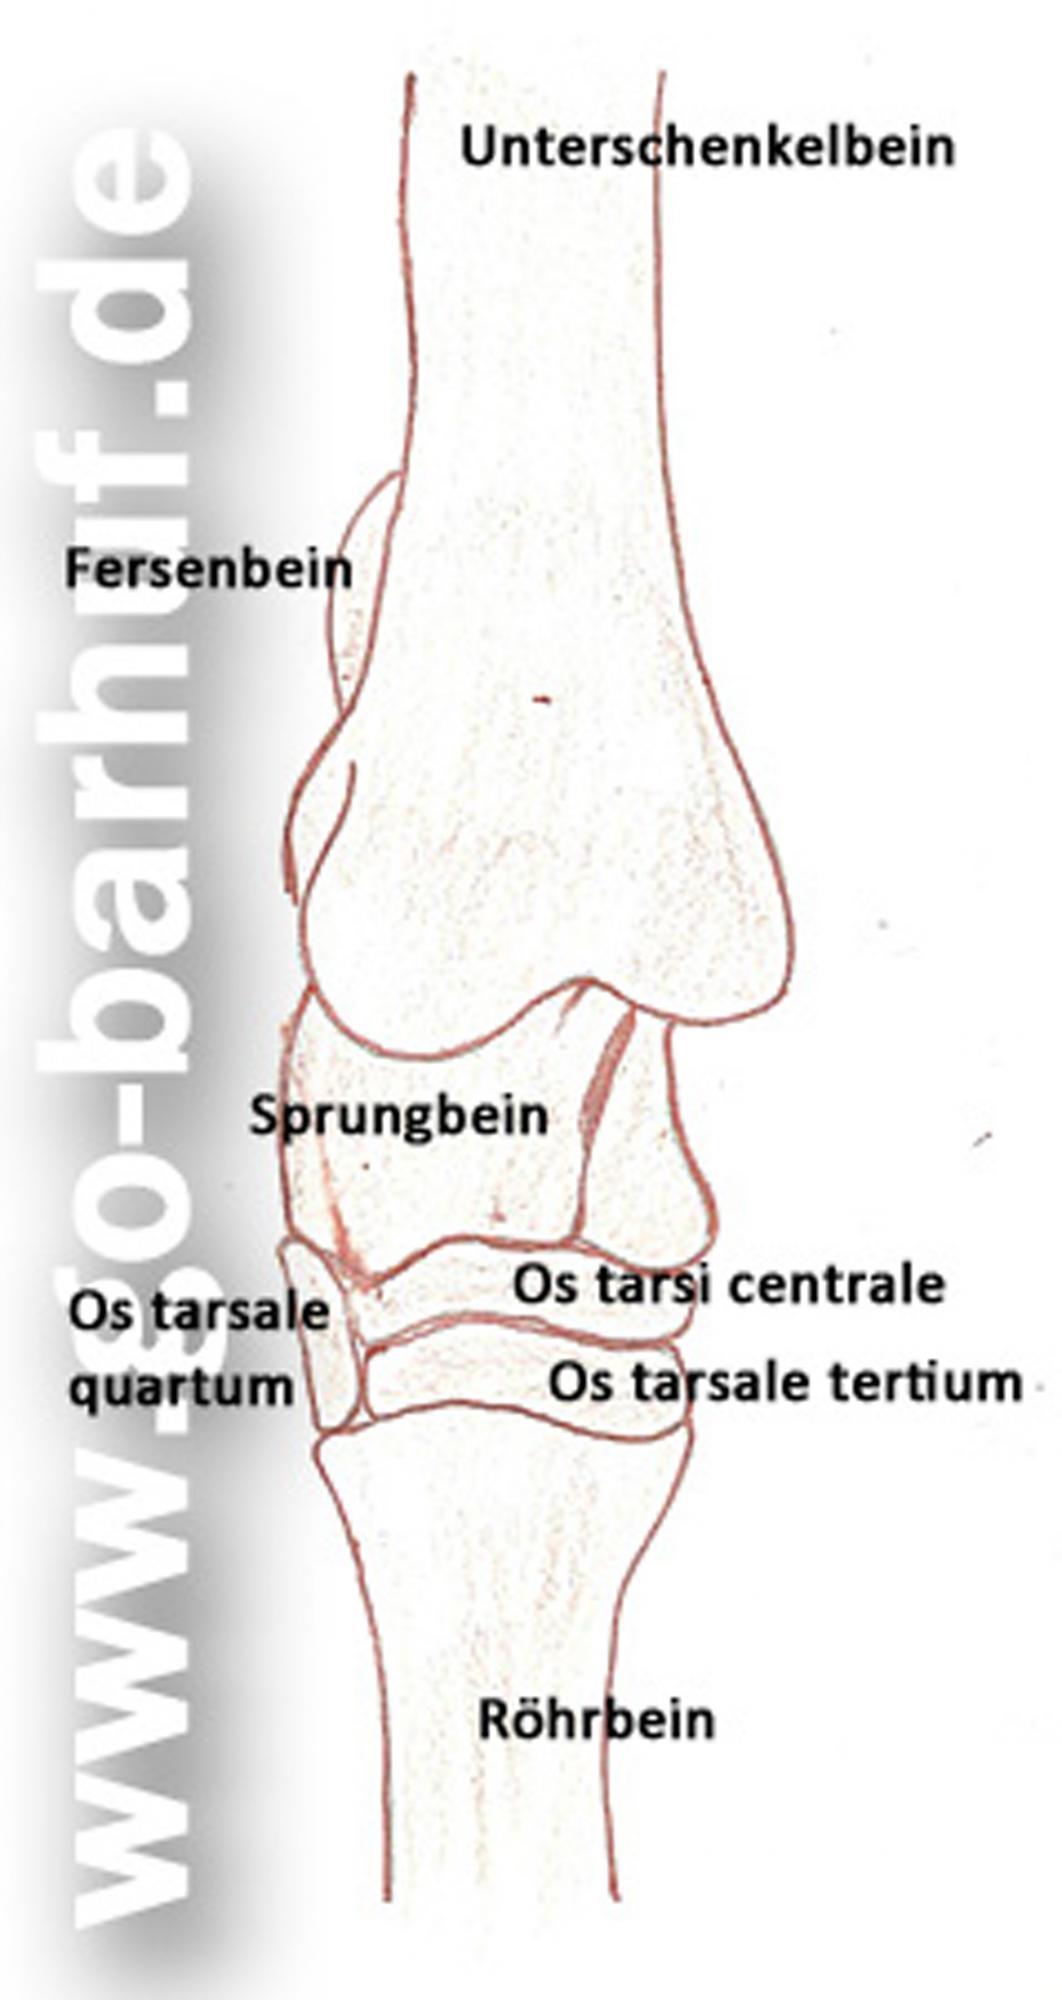 Erfreut Pferd Bein Anatomie Ideen - Anatomie Ideen - finotti.info